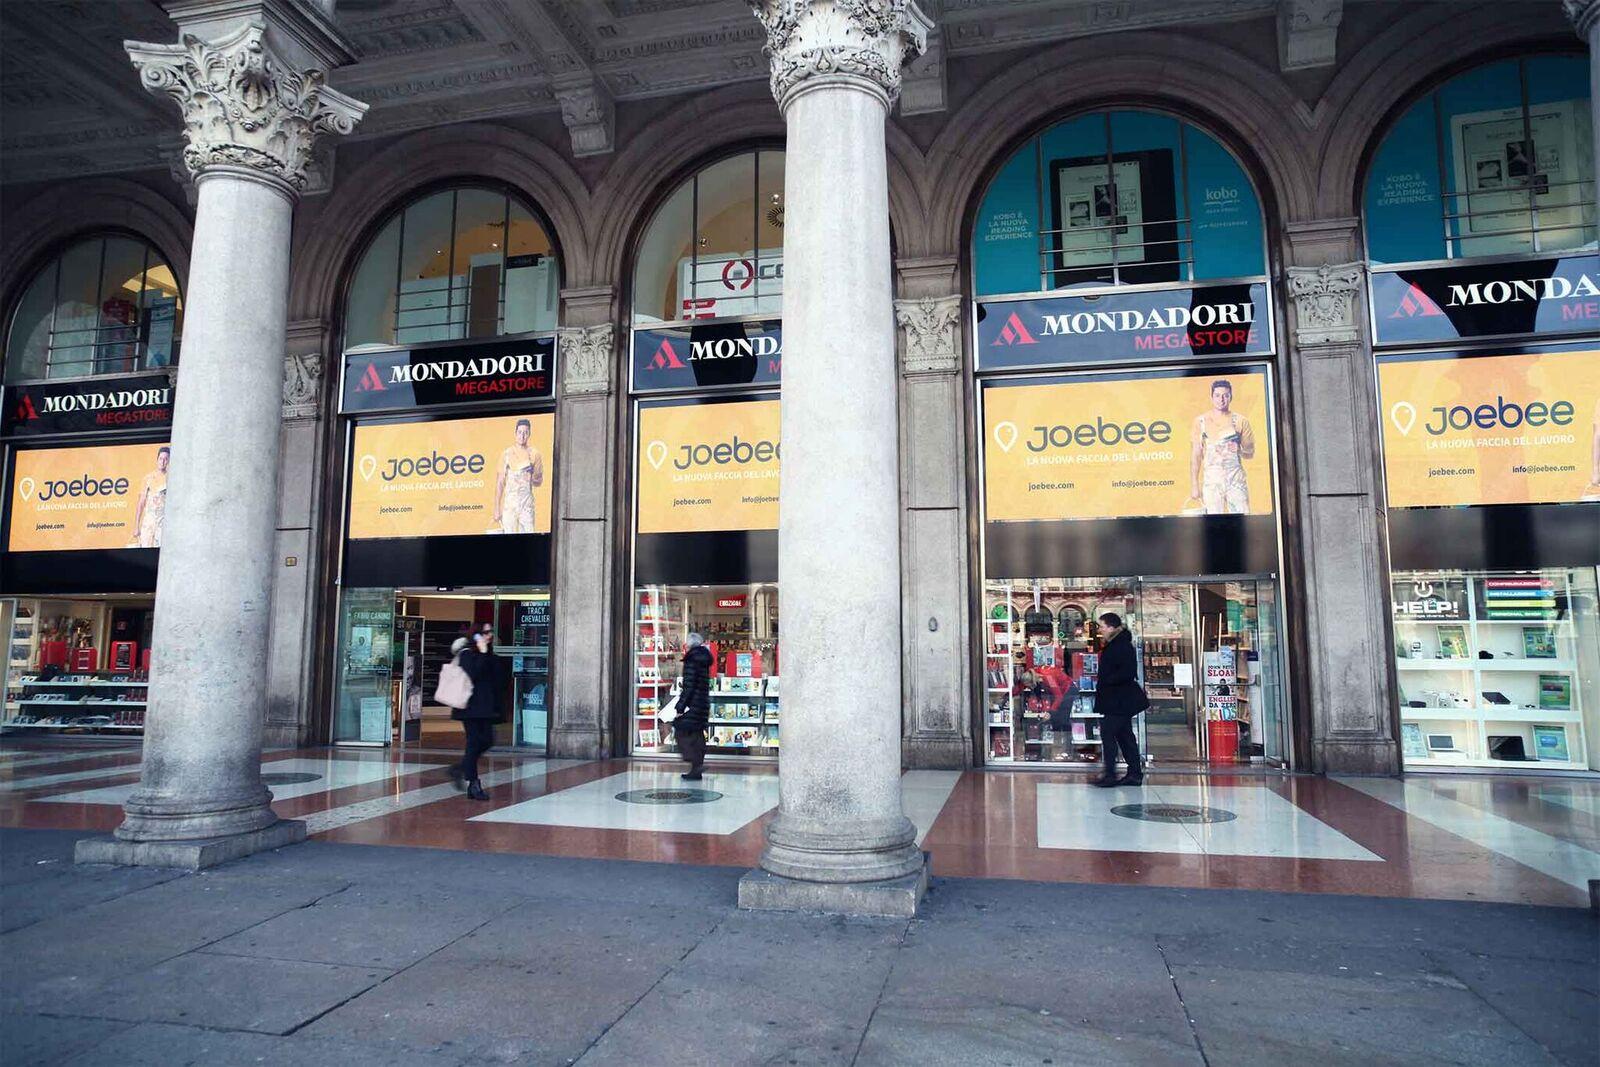 Milano, Mondadori Piazza Duomo